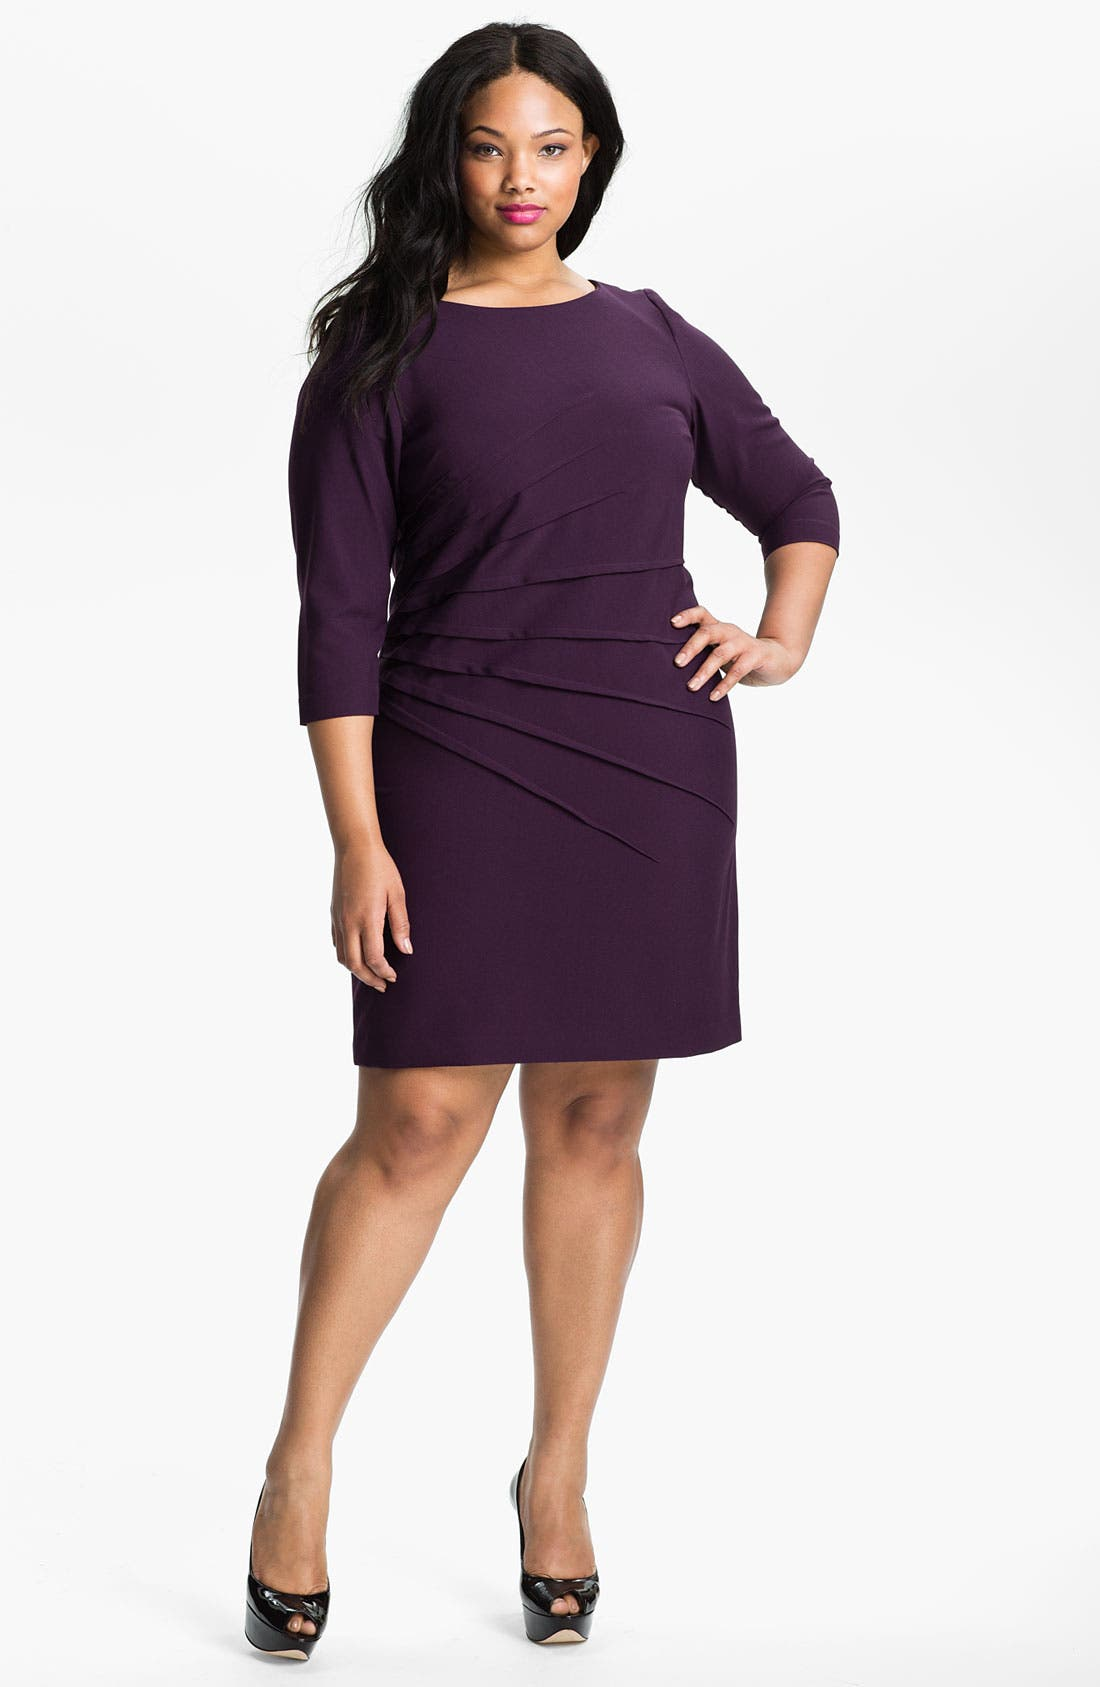 Alternate Image 1 Selected - Eliza J Starburst Pleat Jersey Dress (Plus)